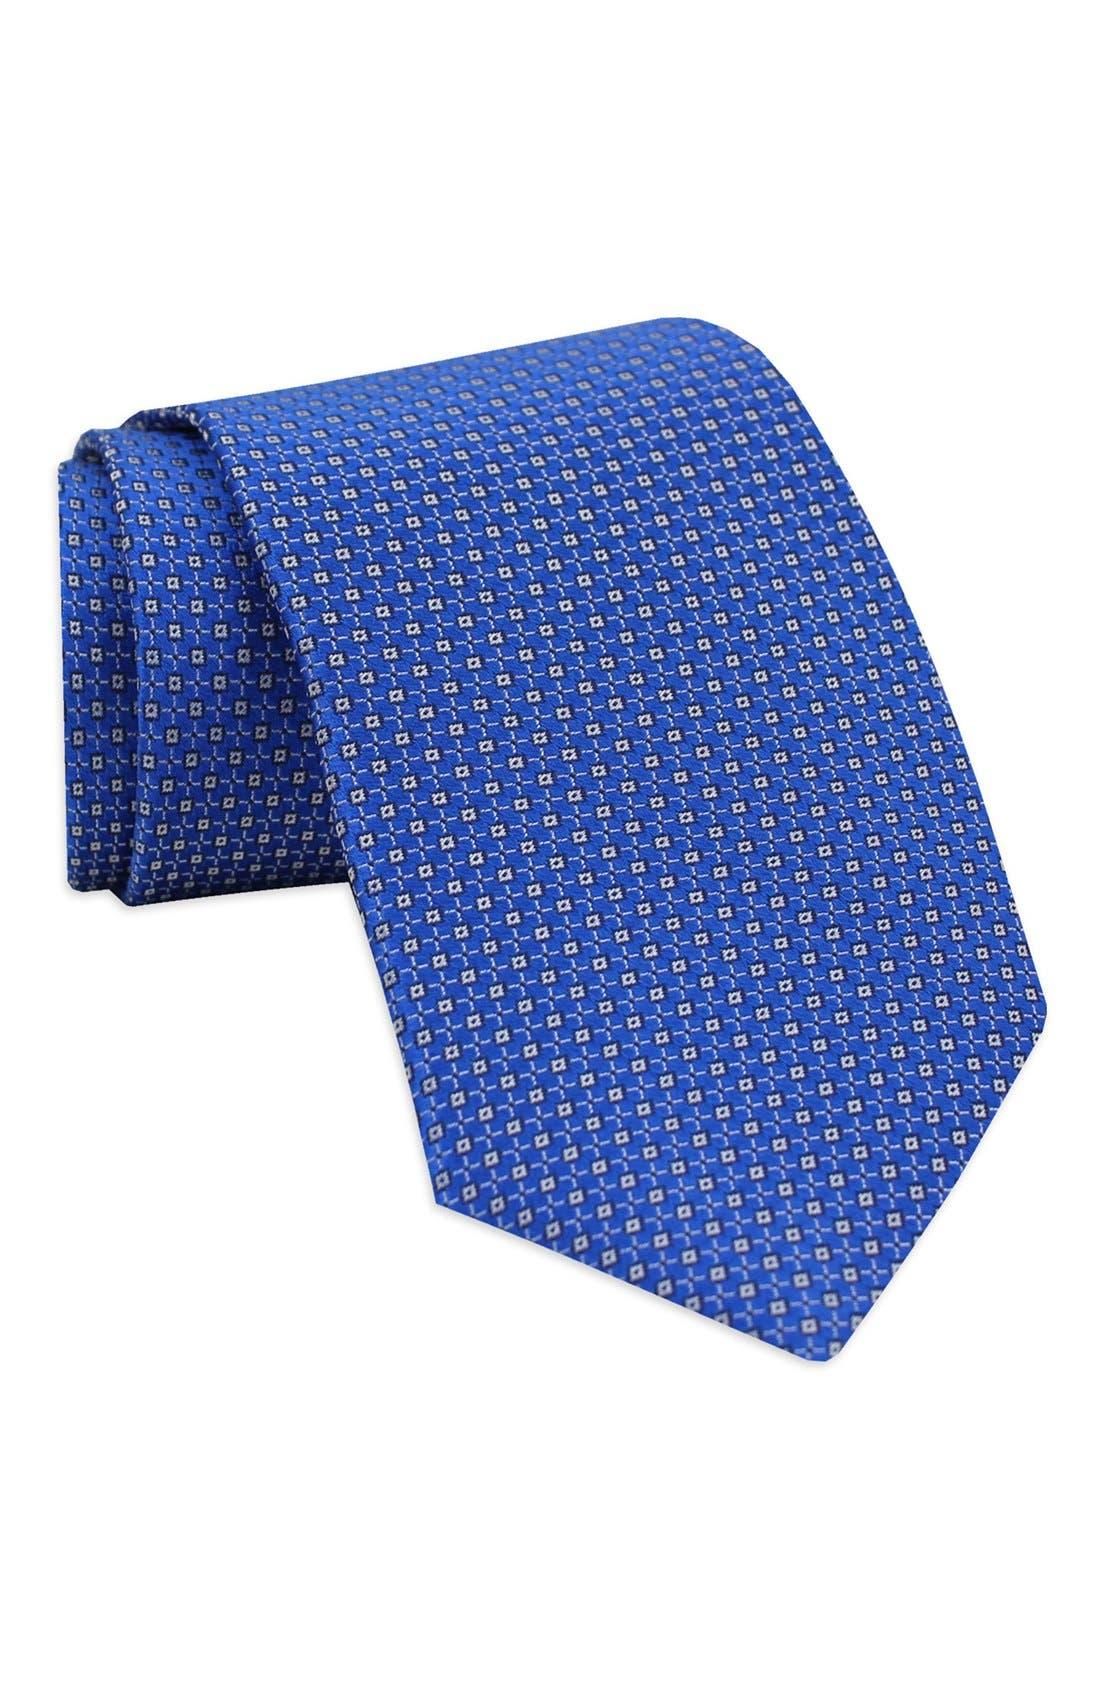 Main Image - Gitman Geometric Woven Silk Tie